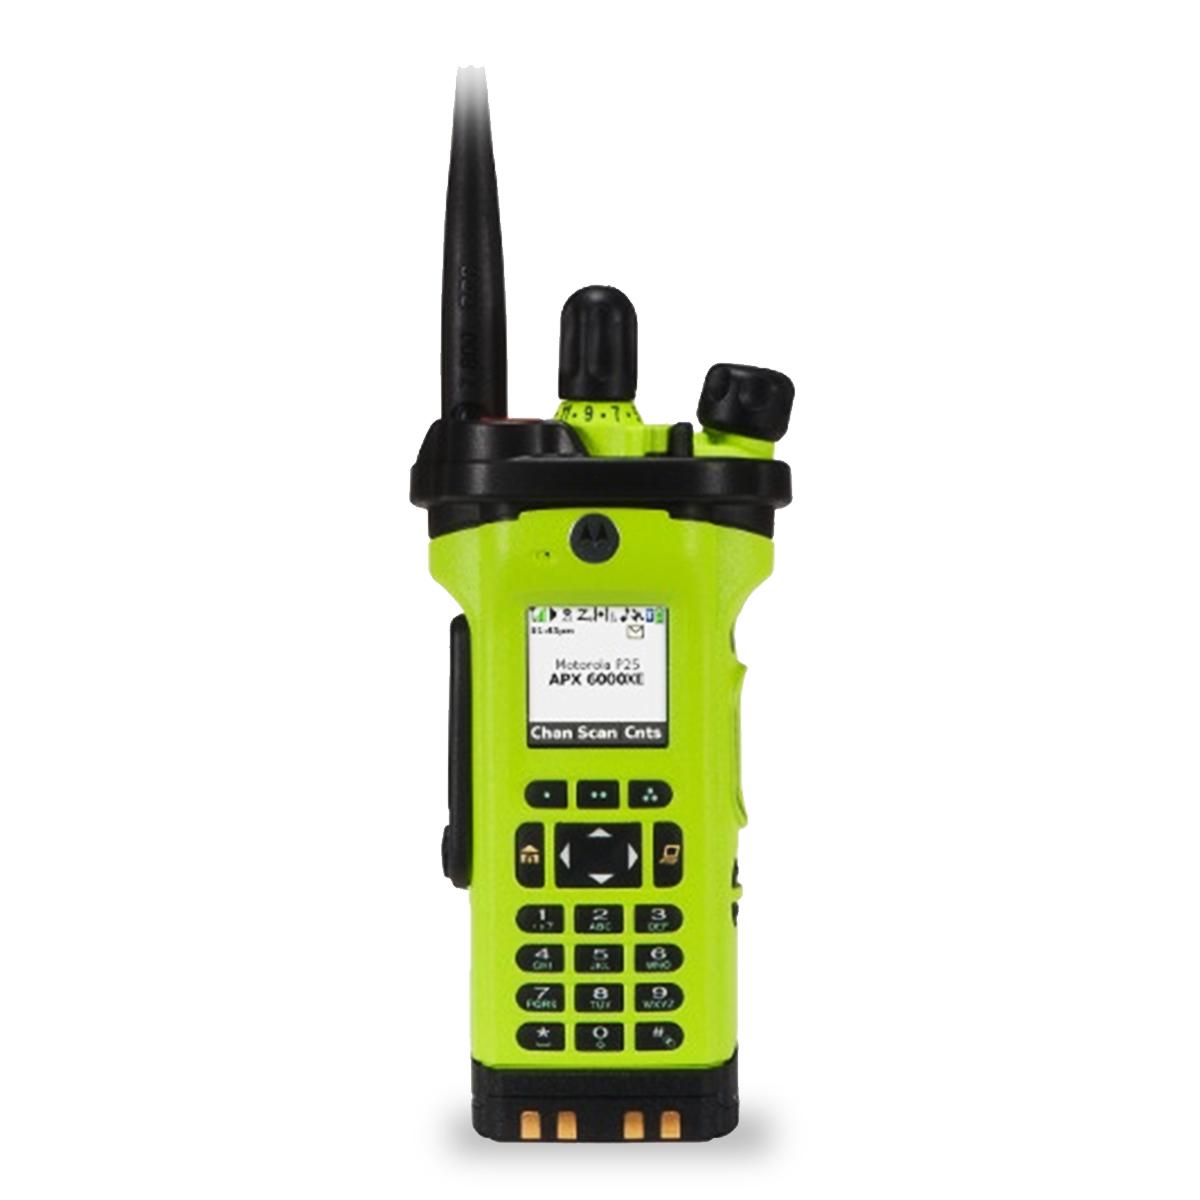 Radio Motorola APX 6000XE P25 Digital